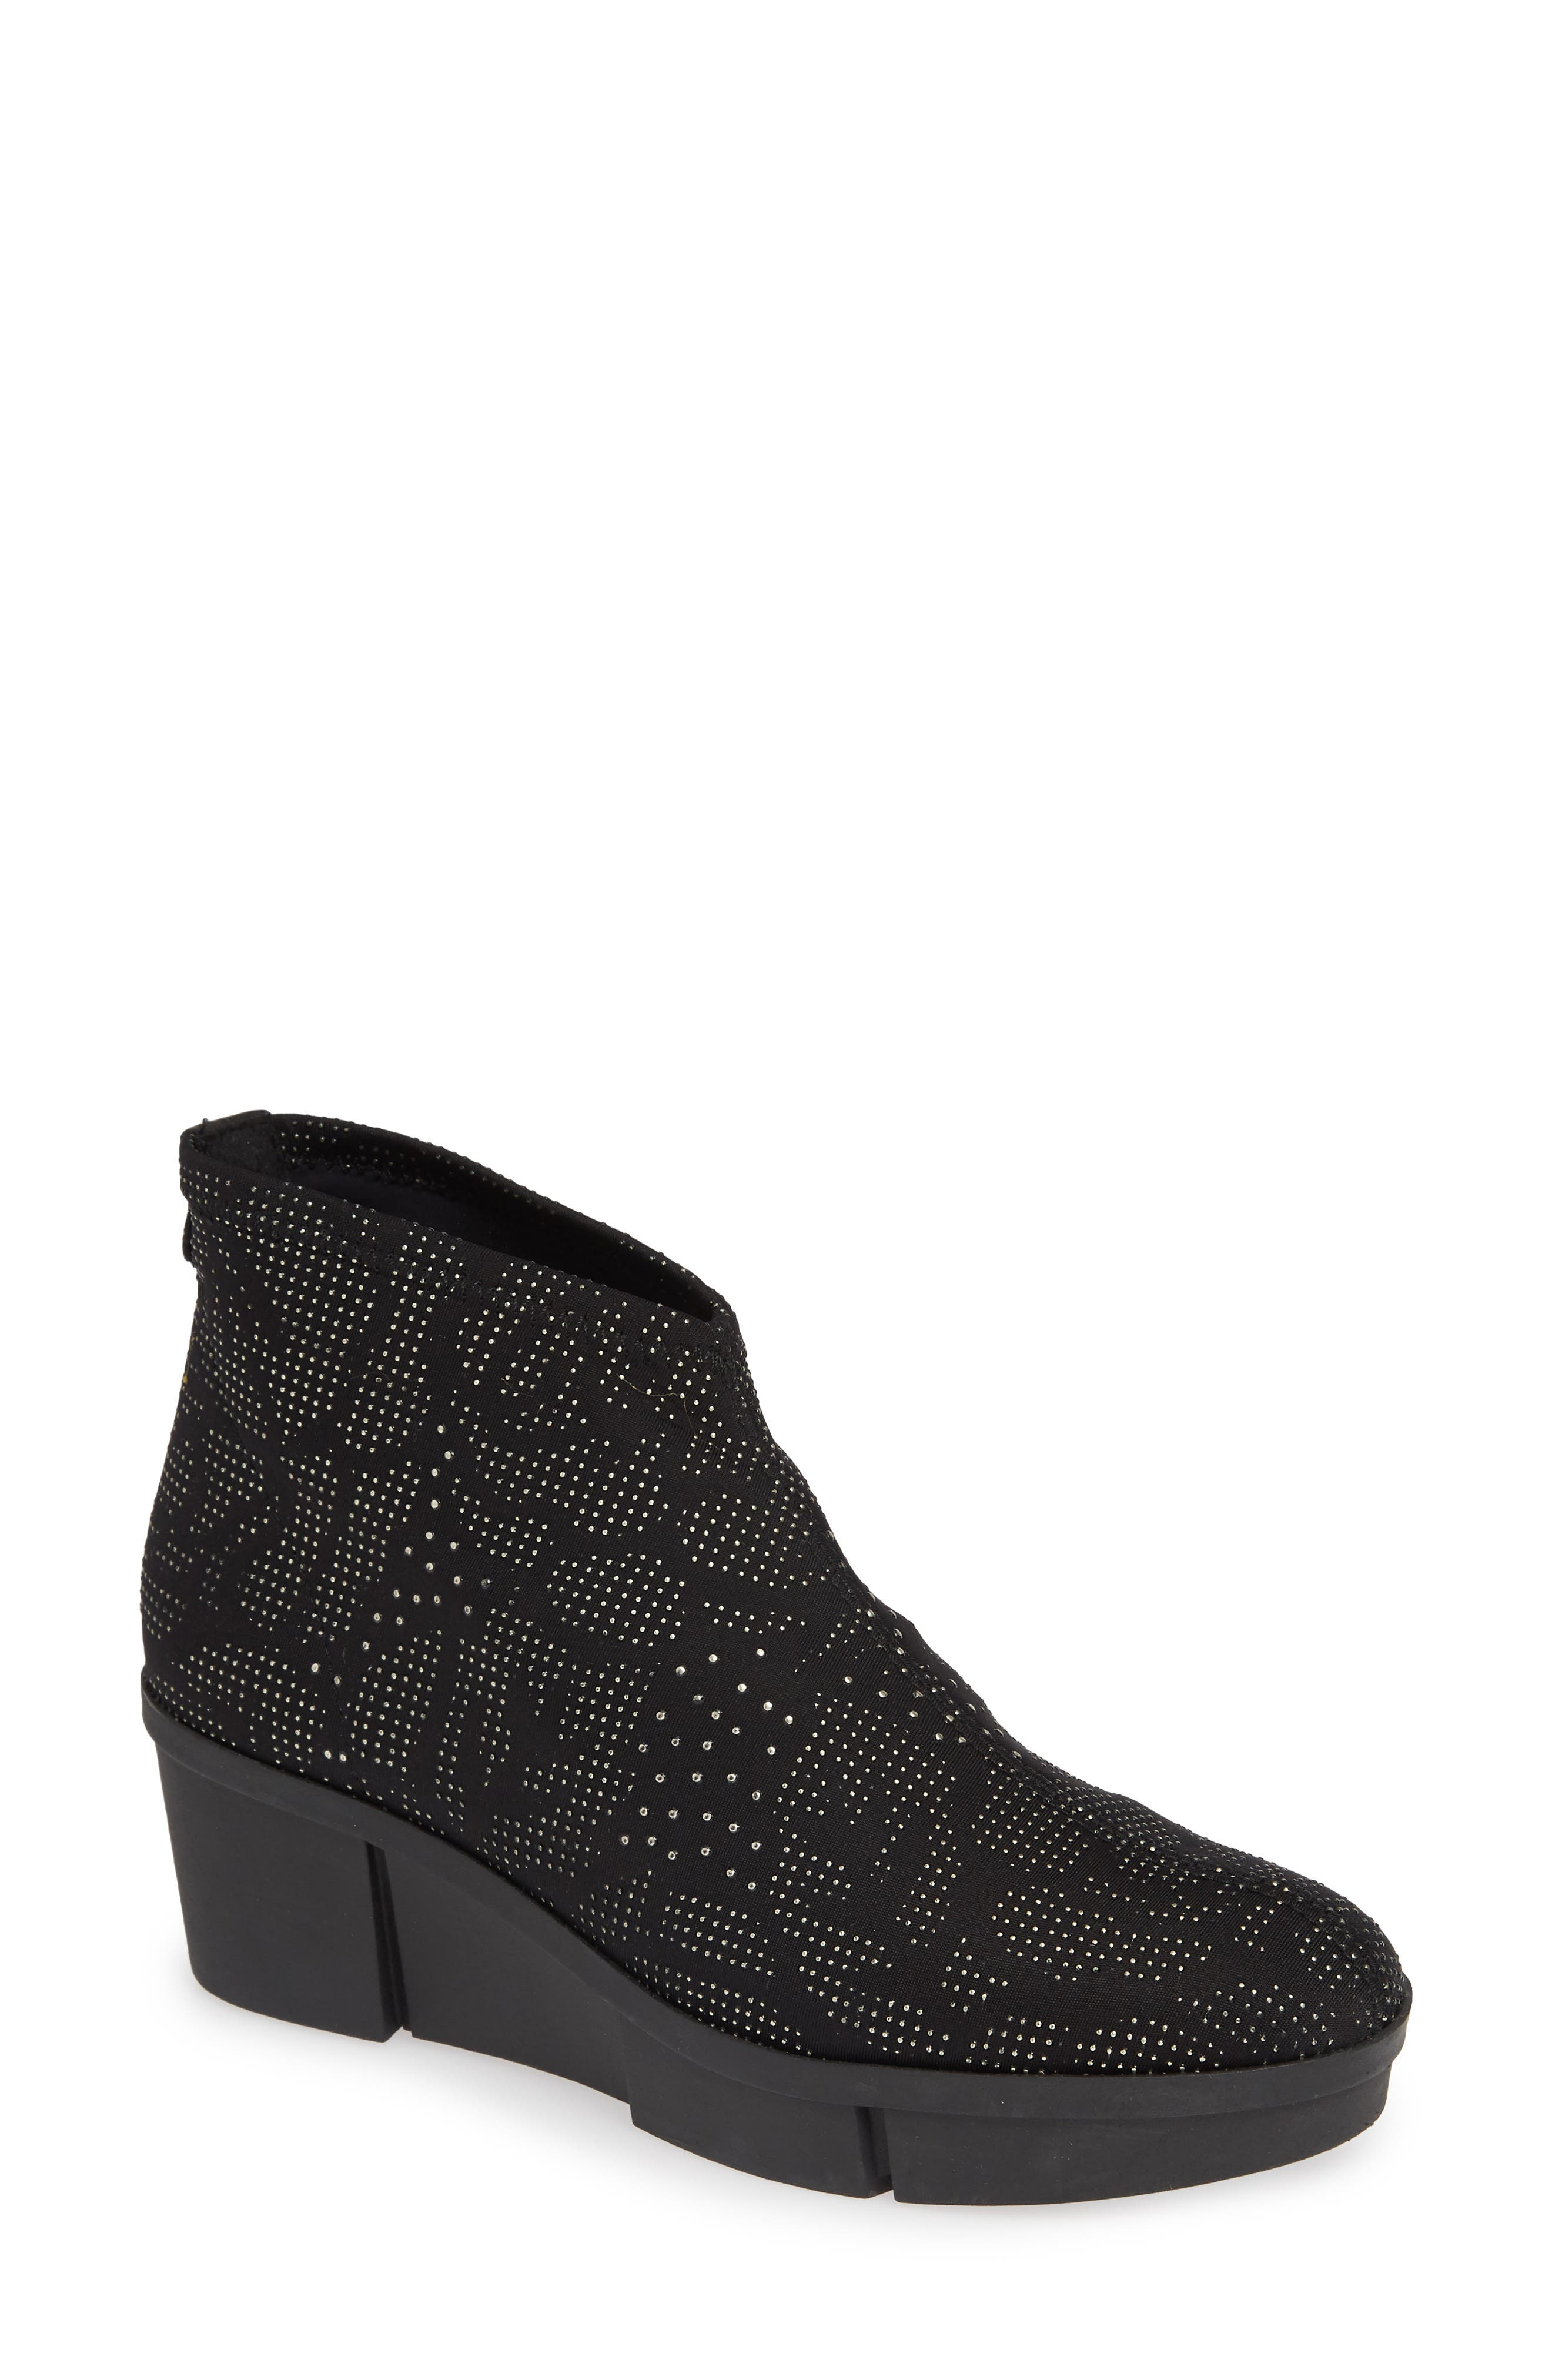 TONI PONS Baku Bootie in Black Studded Fabric